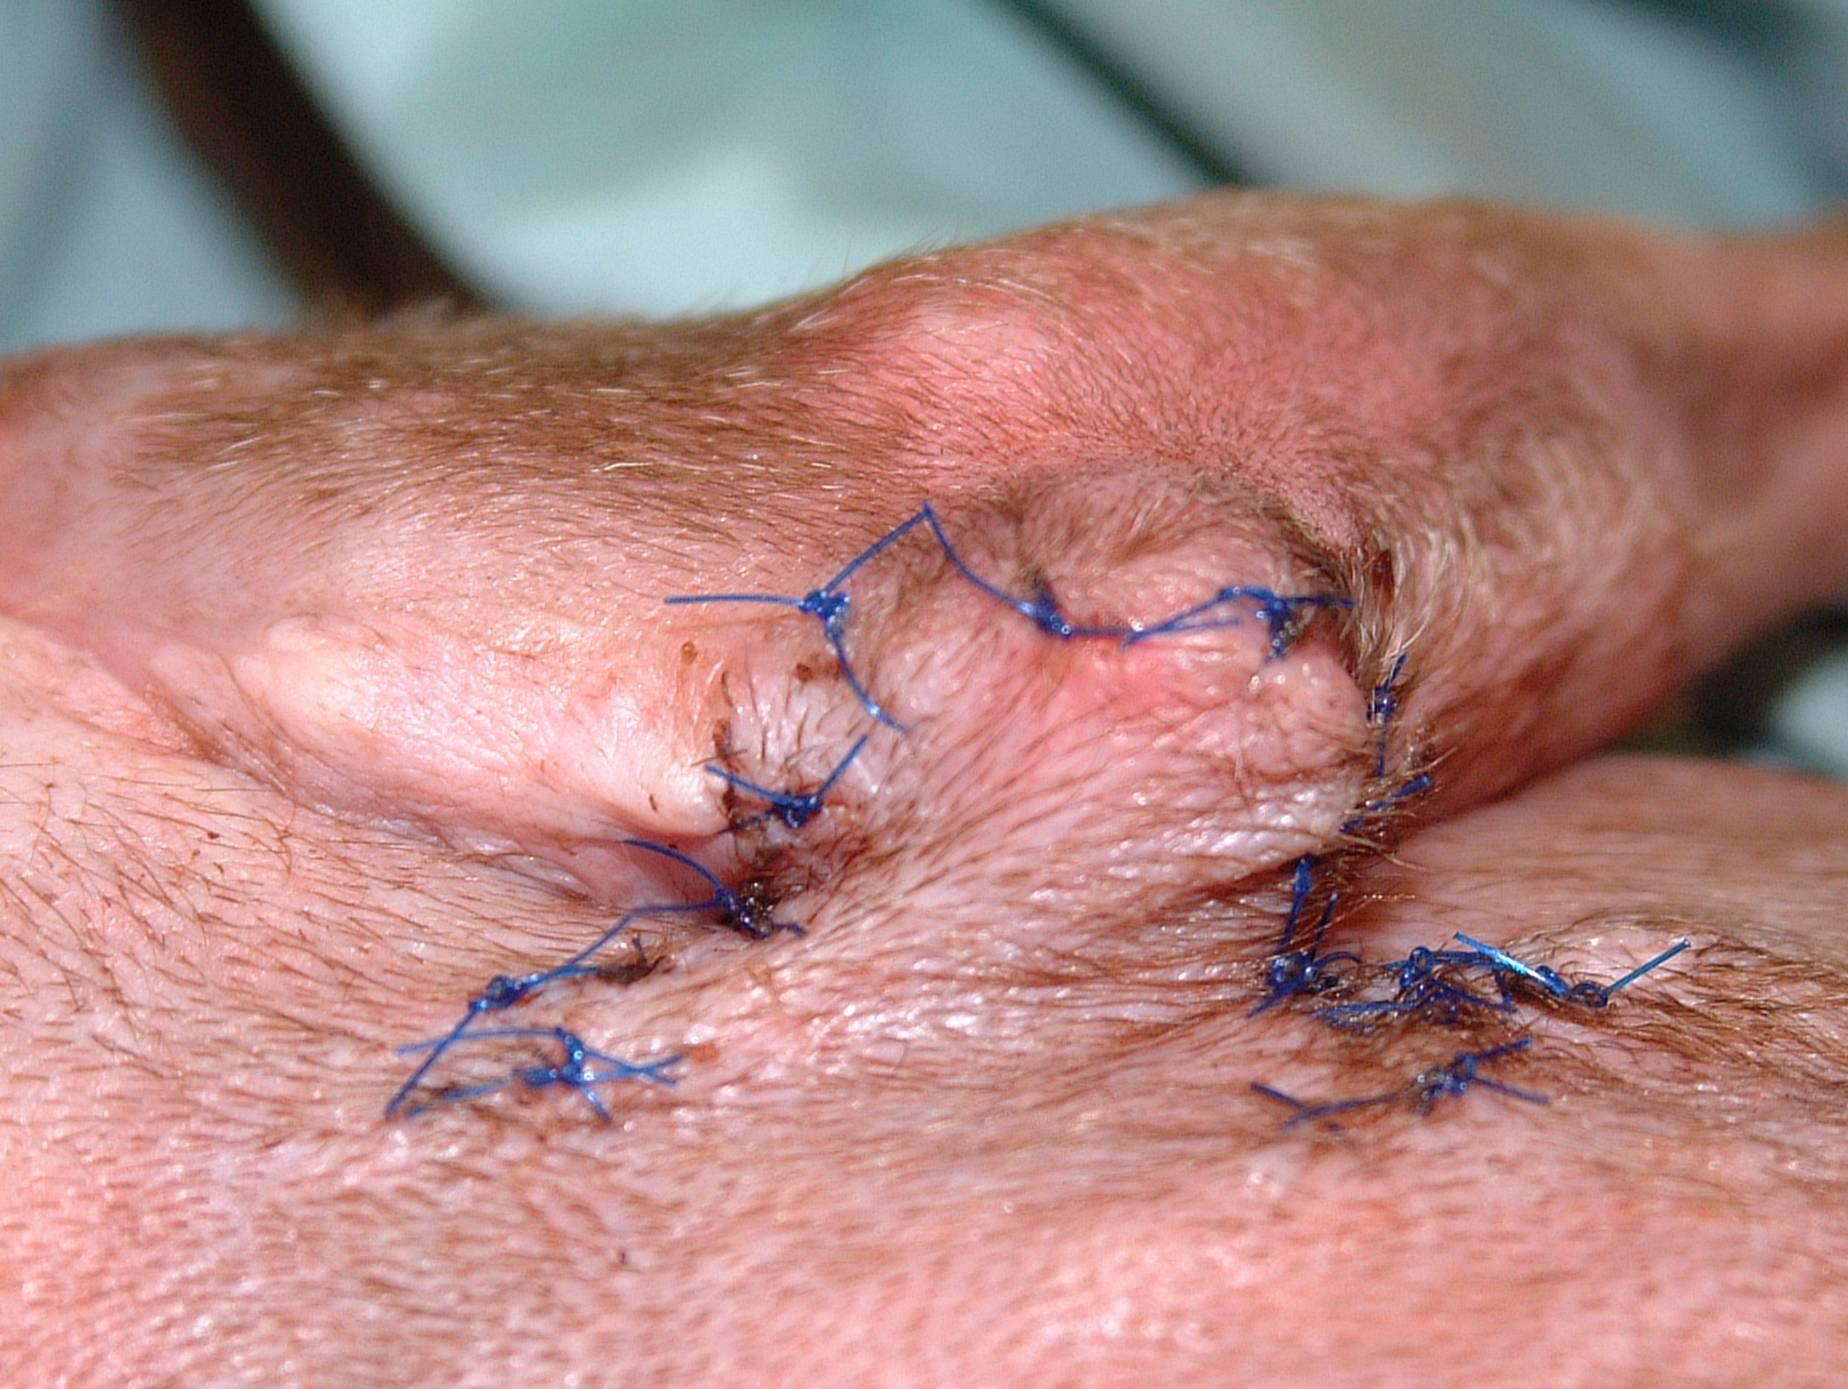 Surgery #2 - Hinge Flap Release